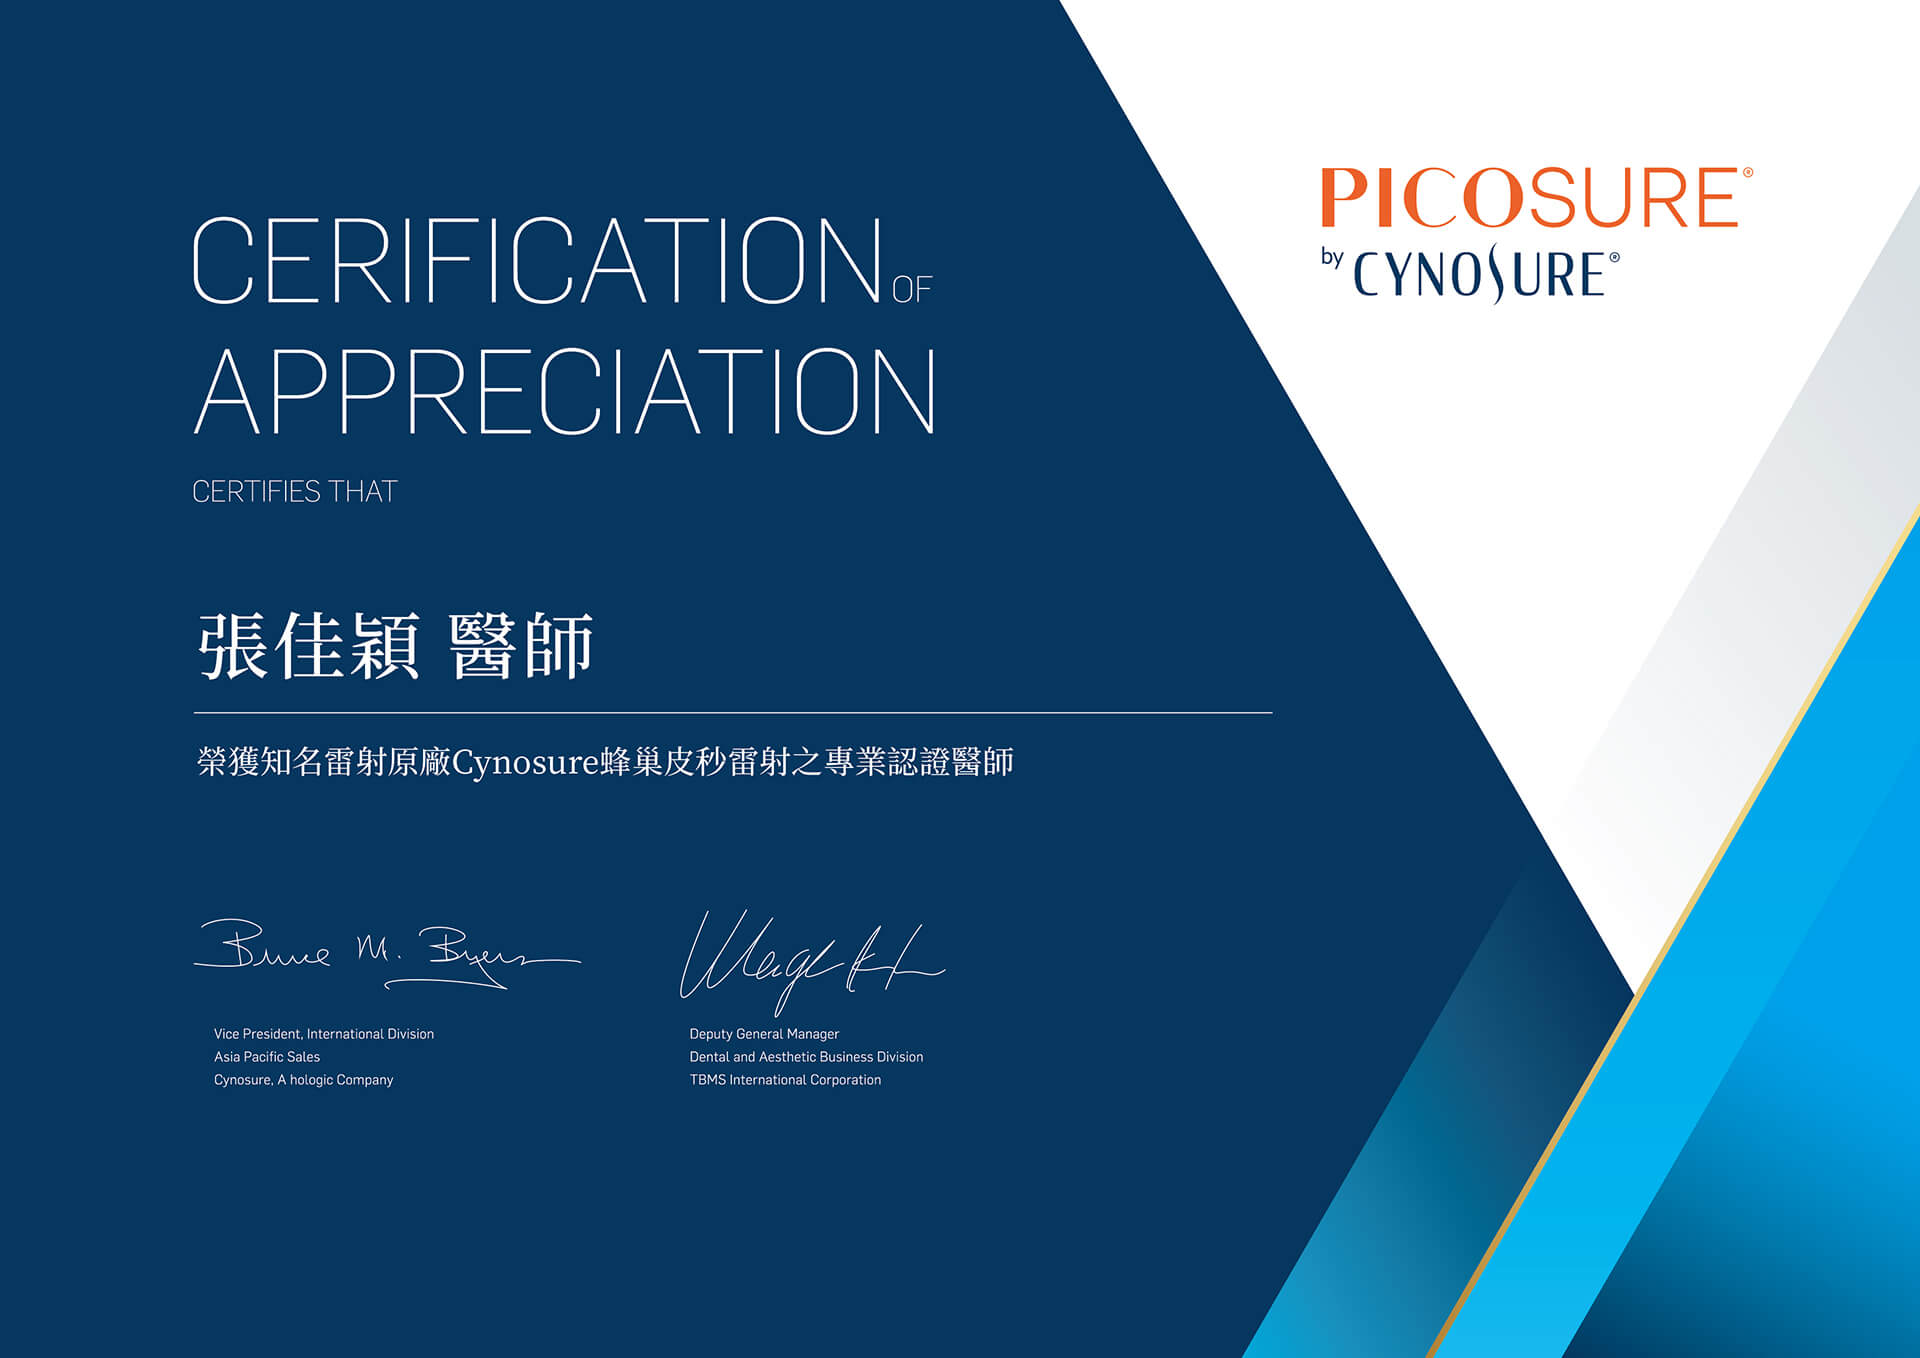 PicoSure認證證書-張佳穎醫師完成-1.jpg